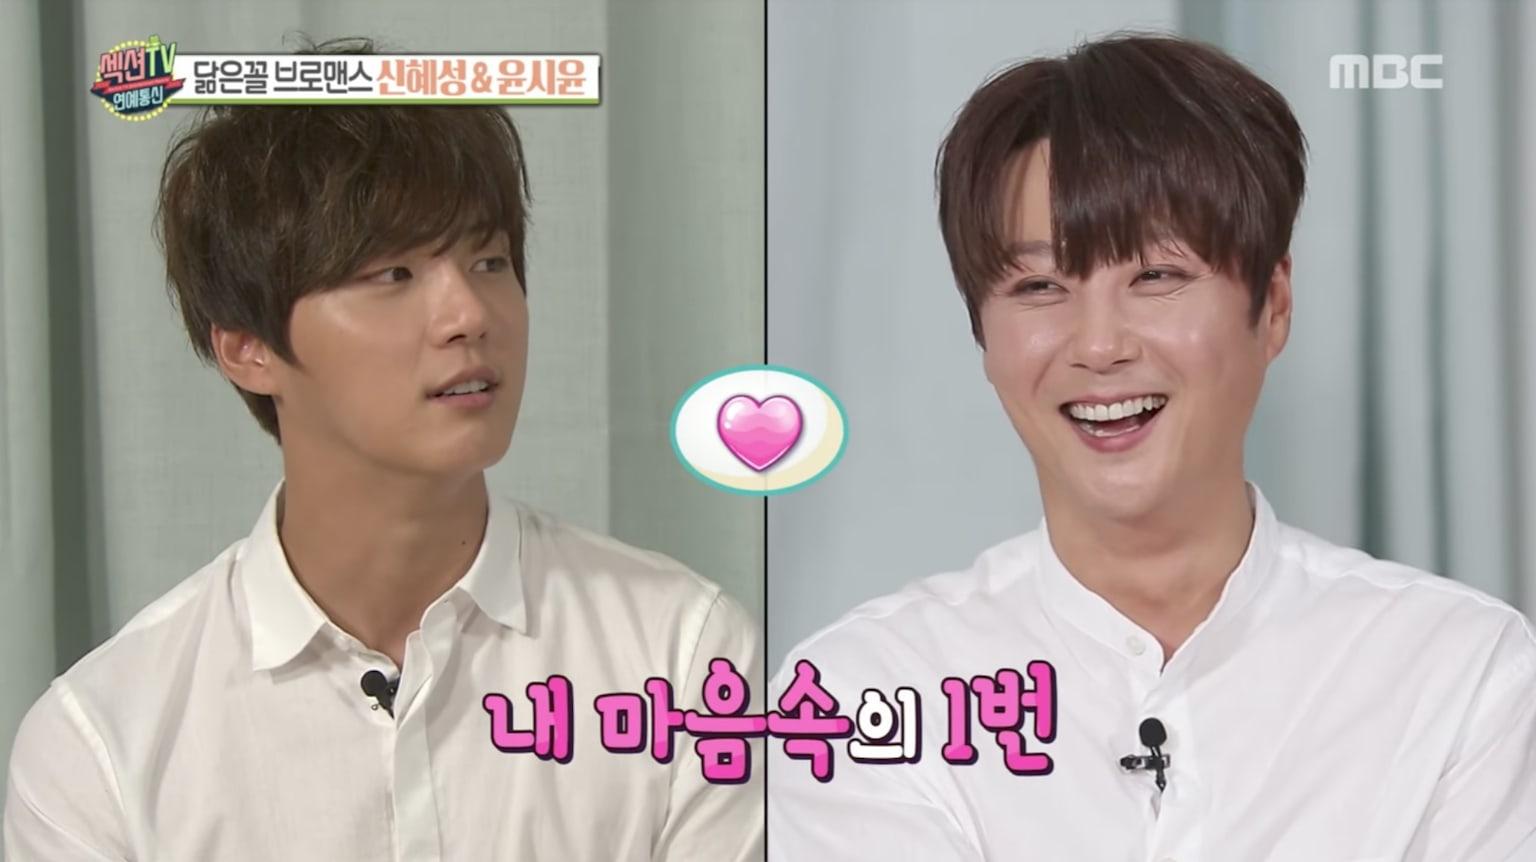 Watch: Lookalikes Yoon Shi Yoon And Shinhwa's Shin Hye Sung Show Off Bromance In Hilarious Interview